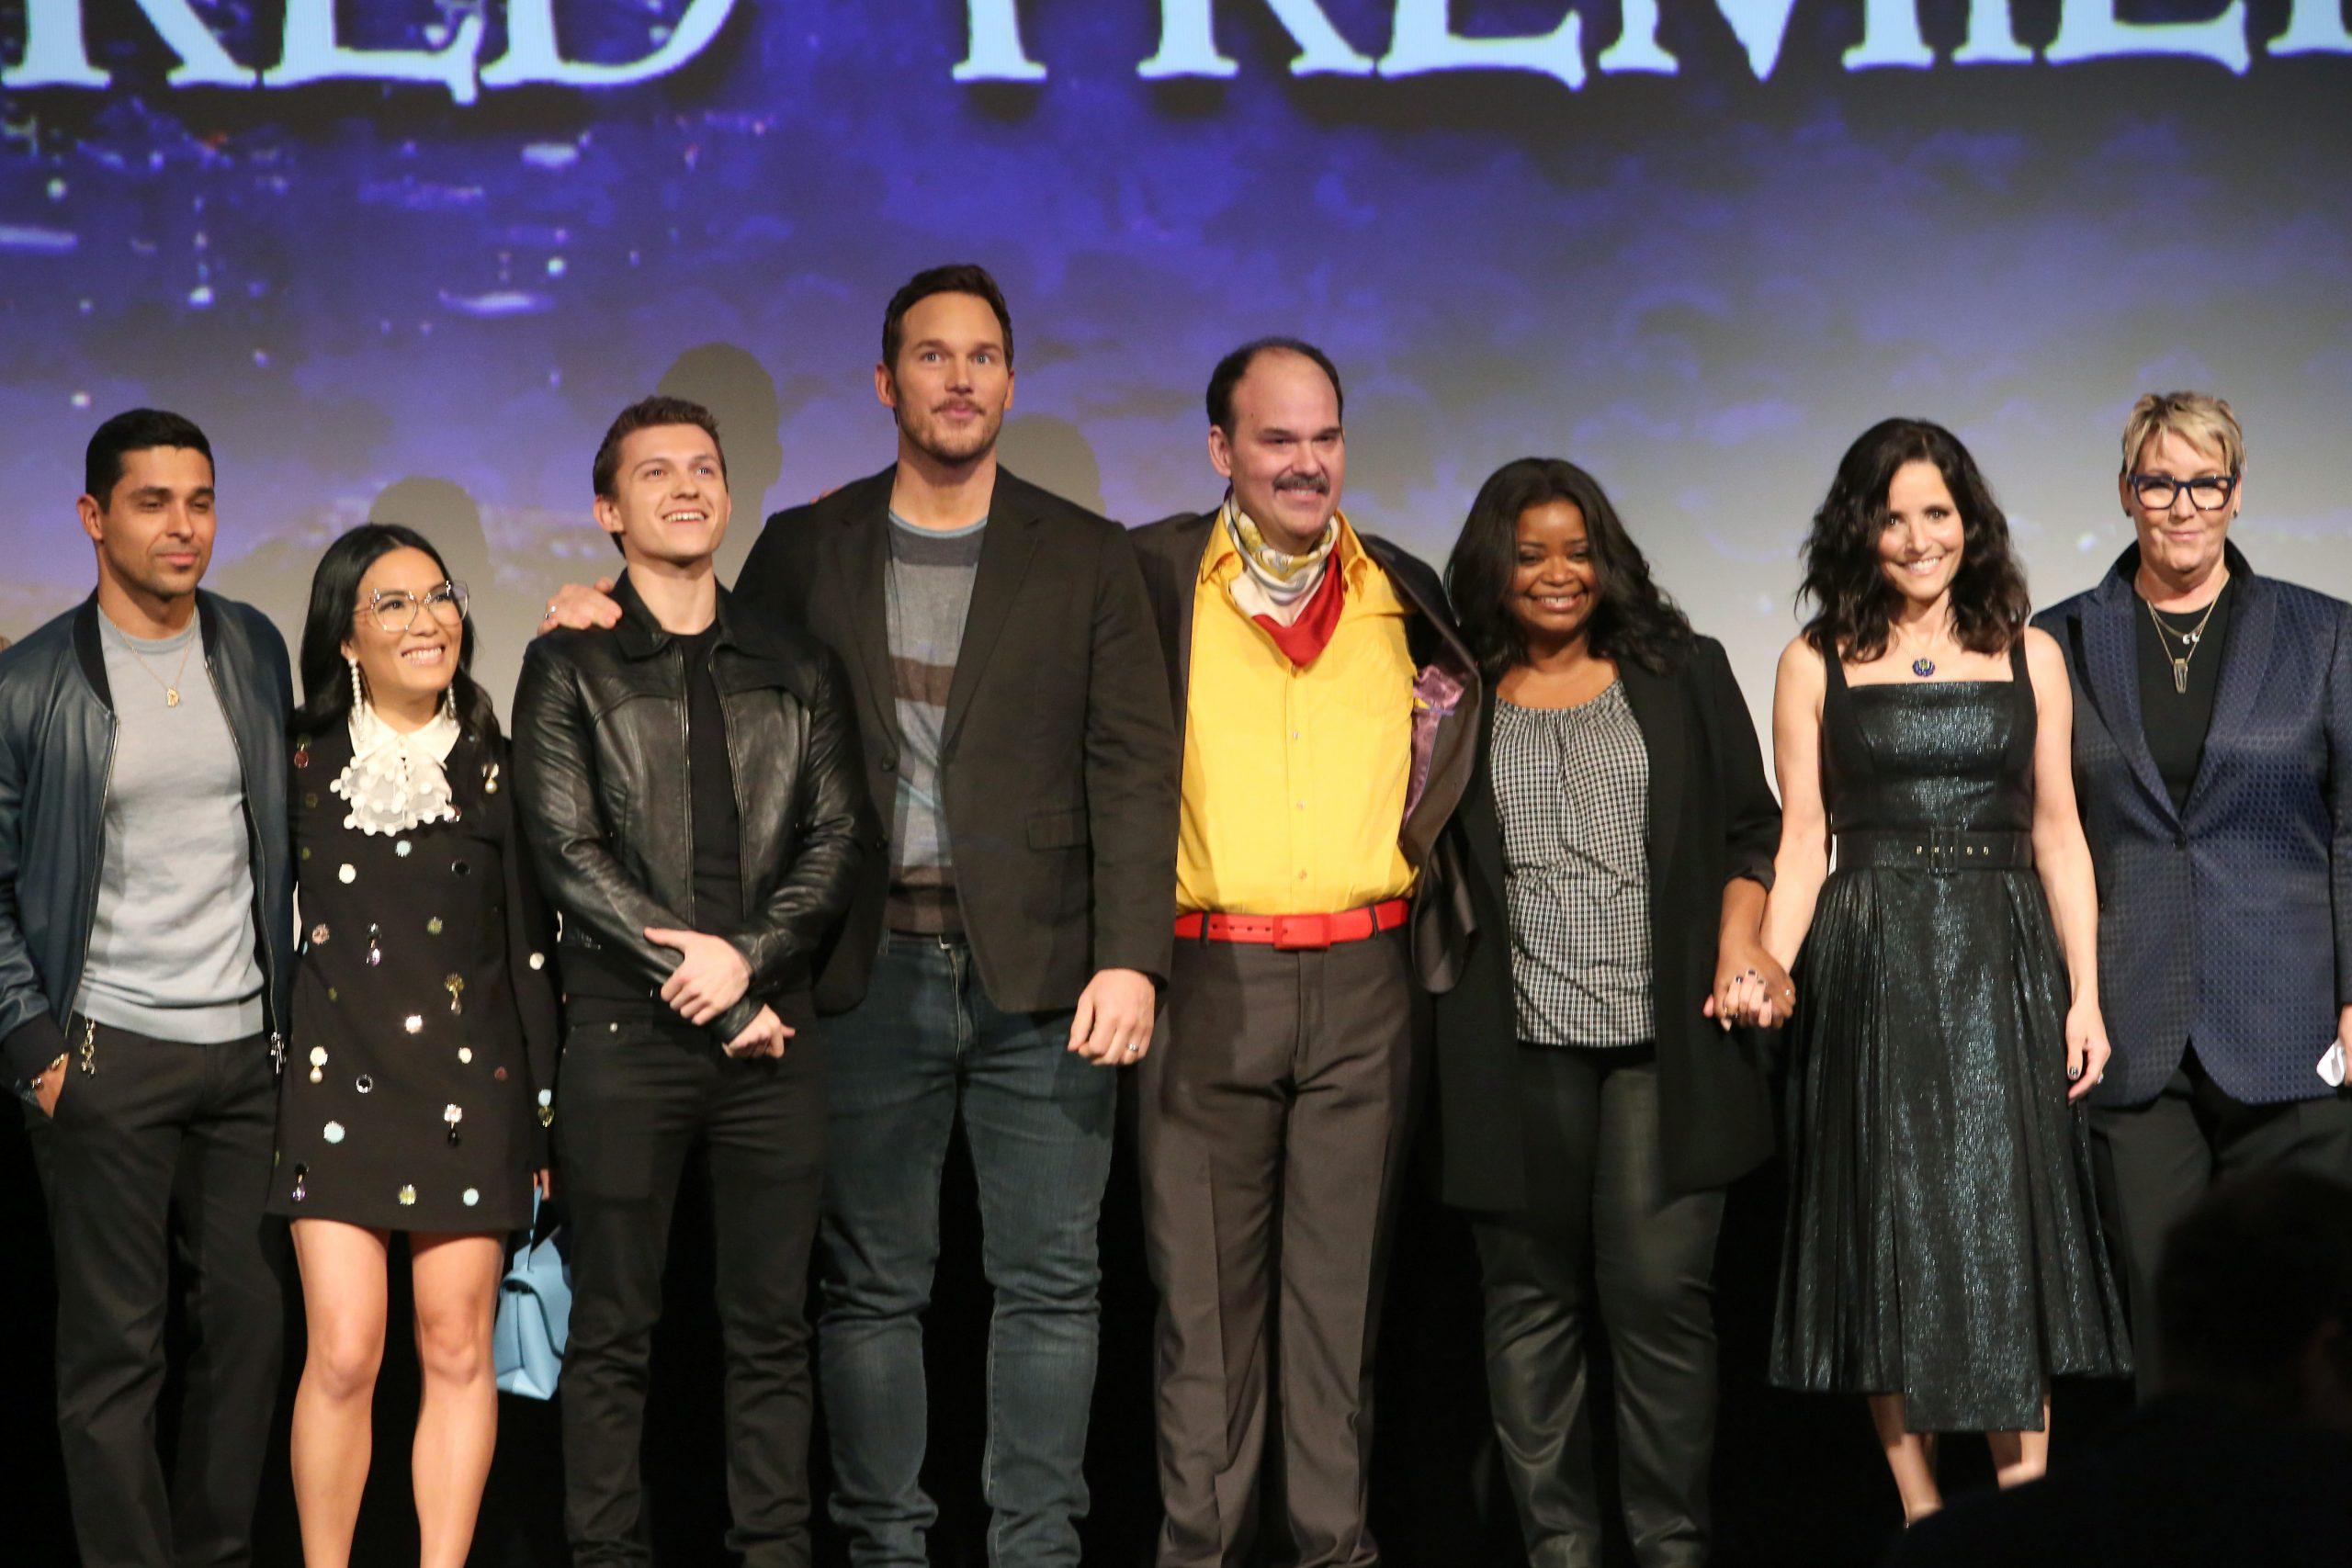 Pics: Disney + Pixar Onward World Premiere